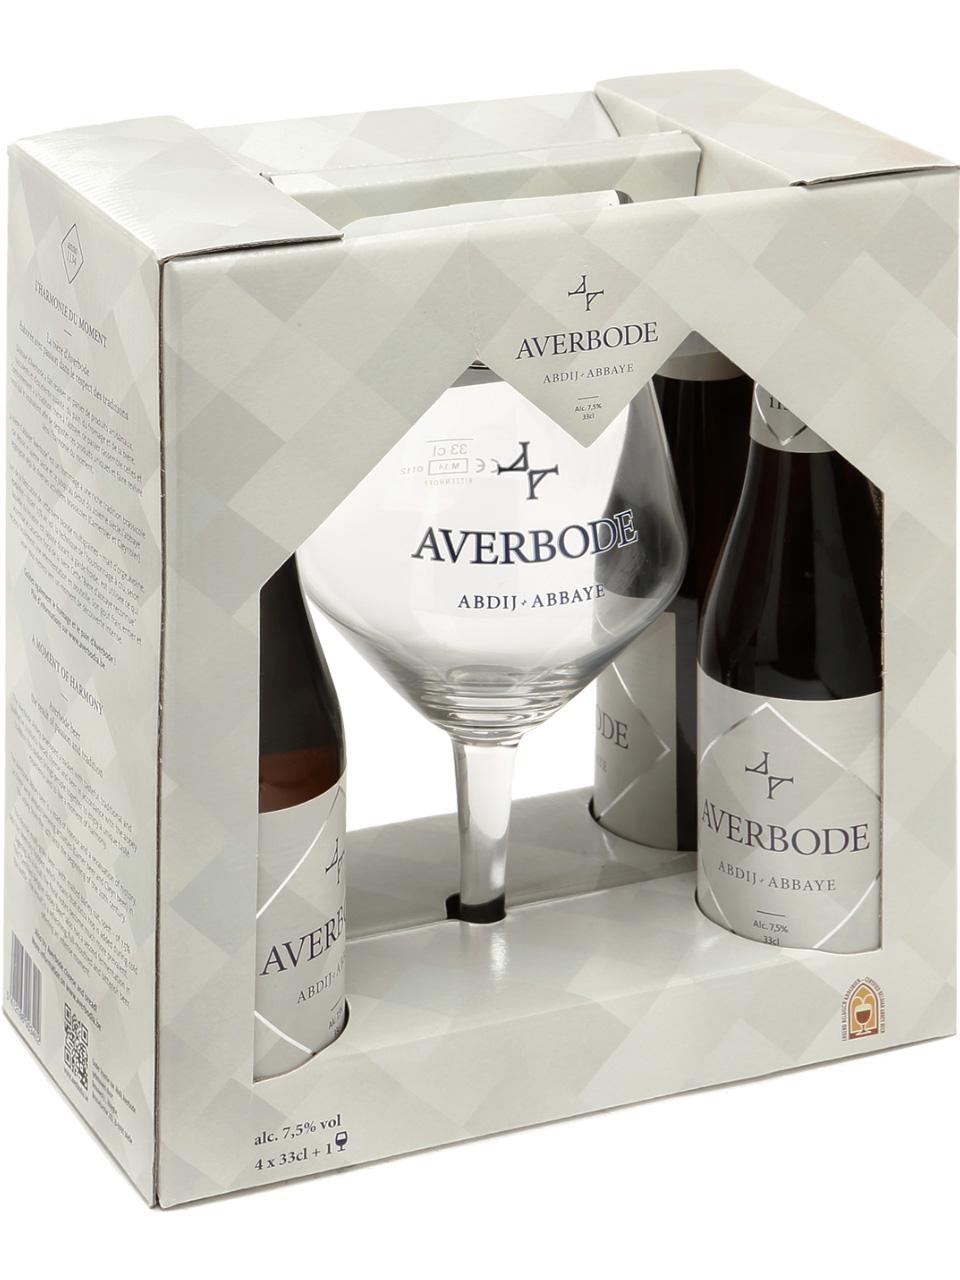 Averbode Blond 4 Pack Btls with Collectors Glass